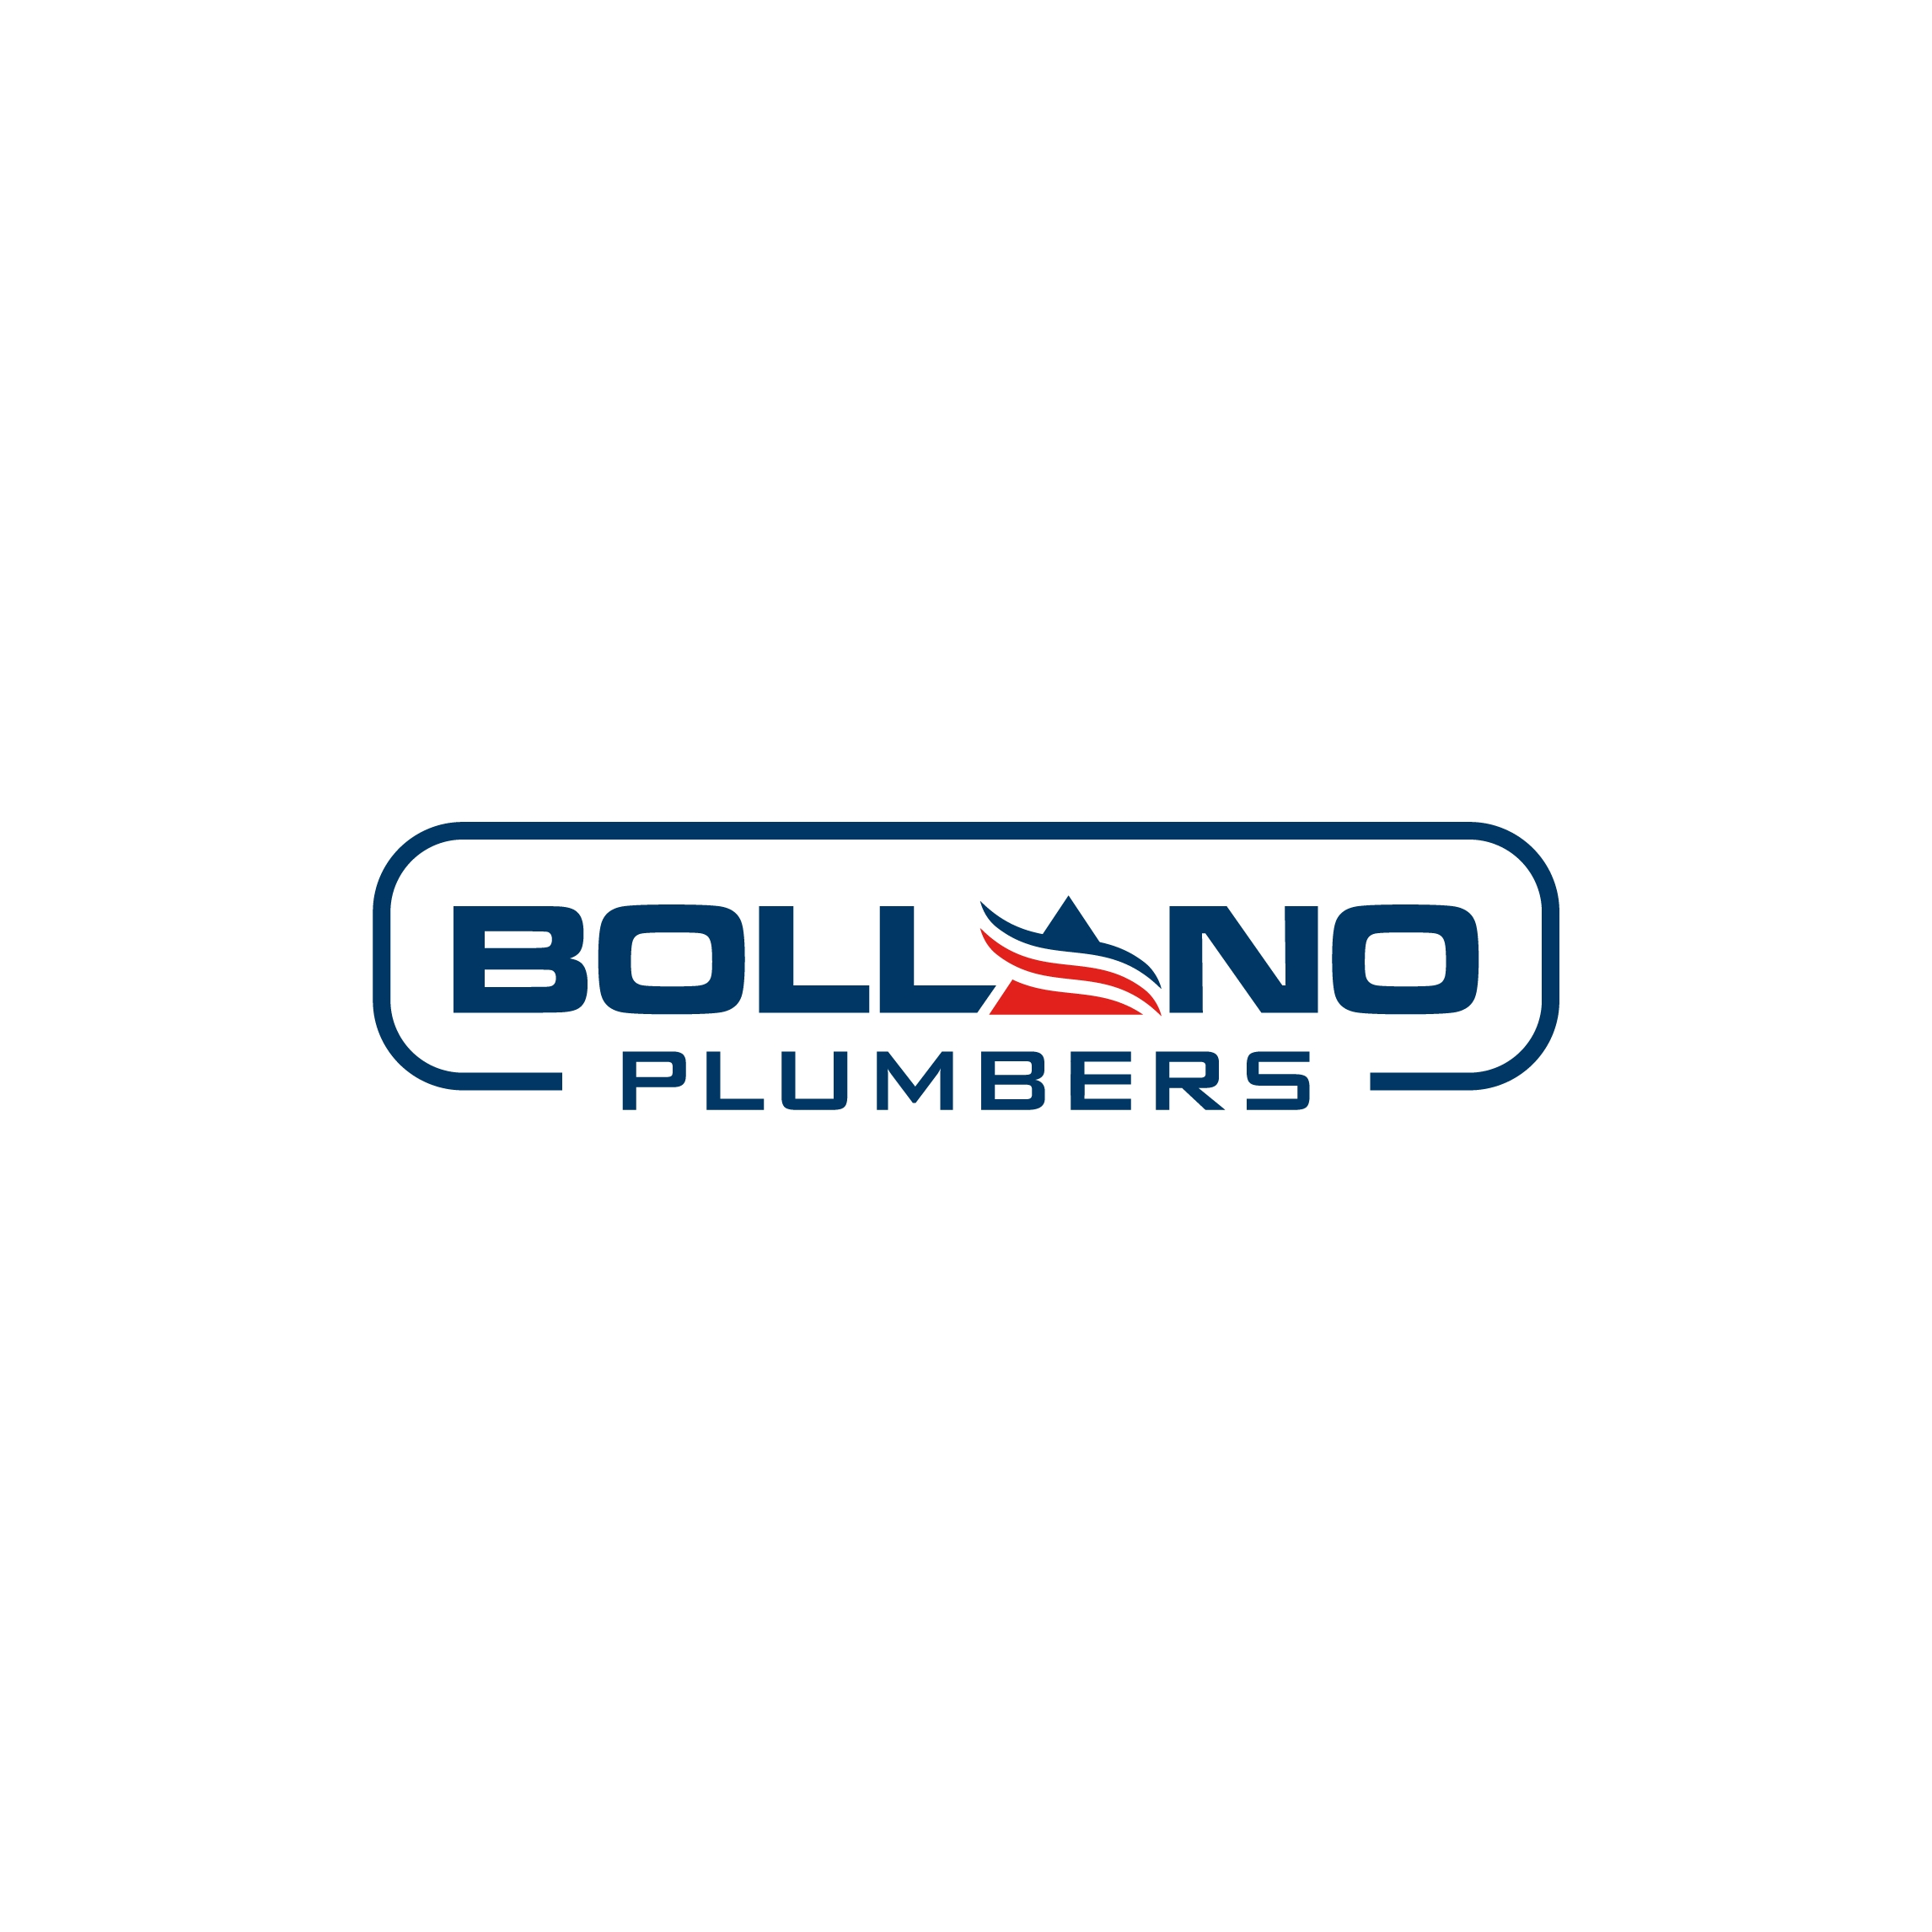 BOLLANO PLUMBERS LIMITED